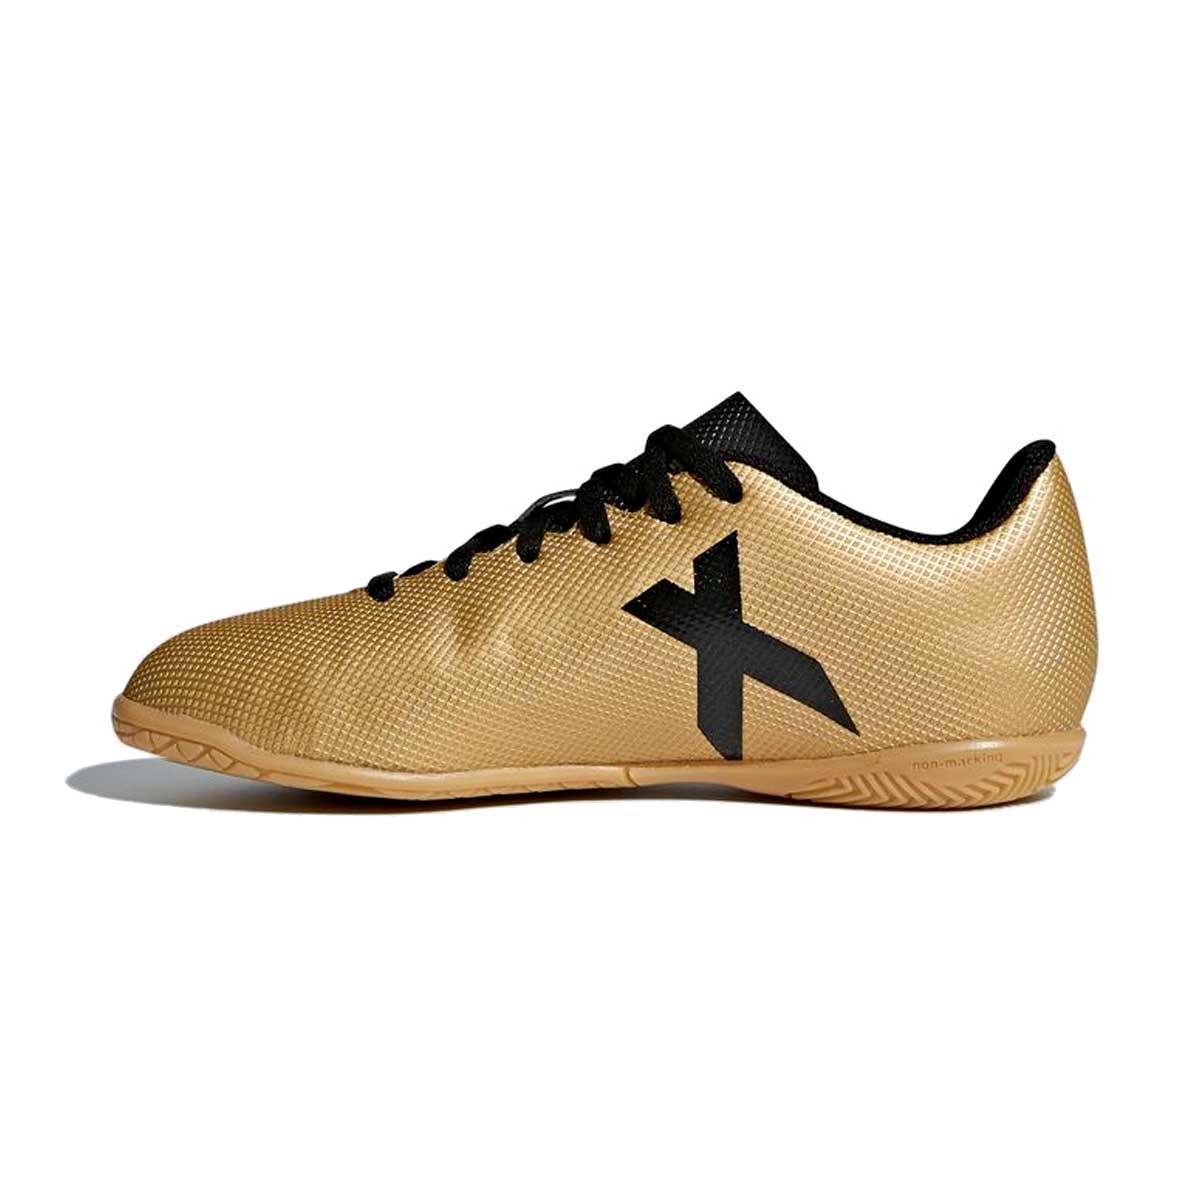 d3af840cbf568 Chuteira Adidas X 17.4 Futsal Infantil